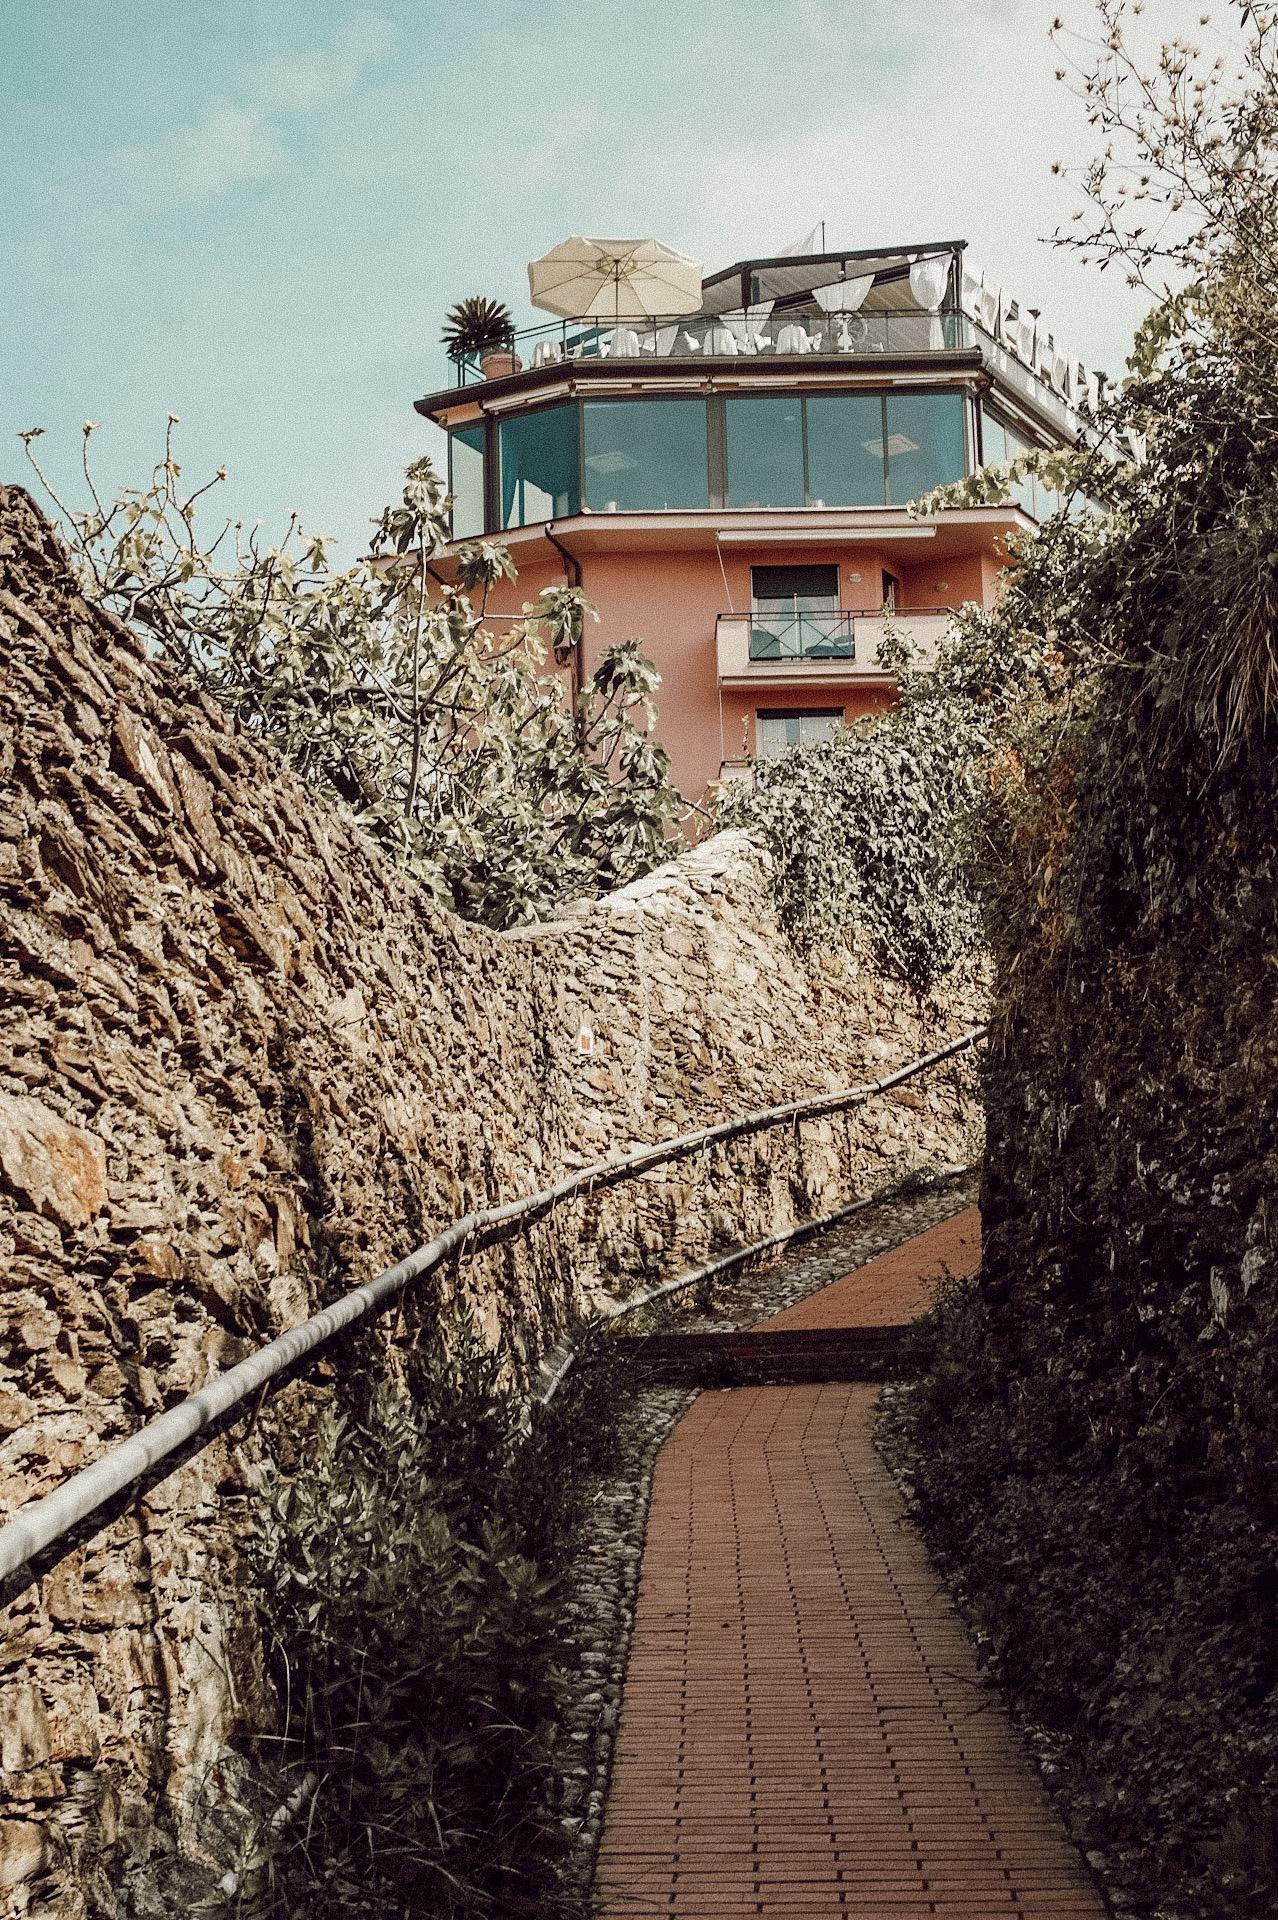 Sestri Levante, Punta Manara, Ligurien Reisebeitrag, Italien Reise